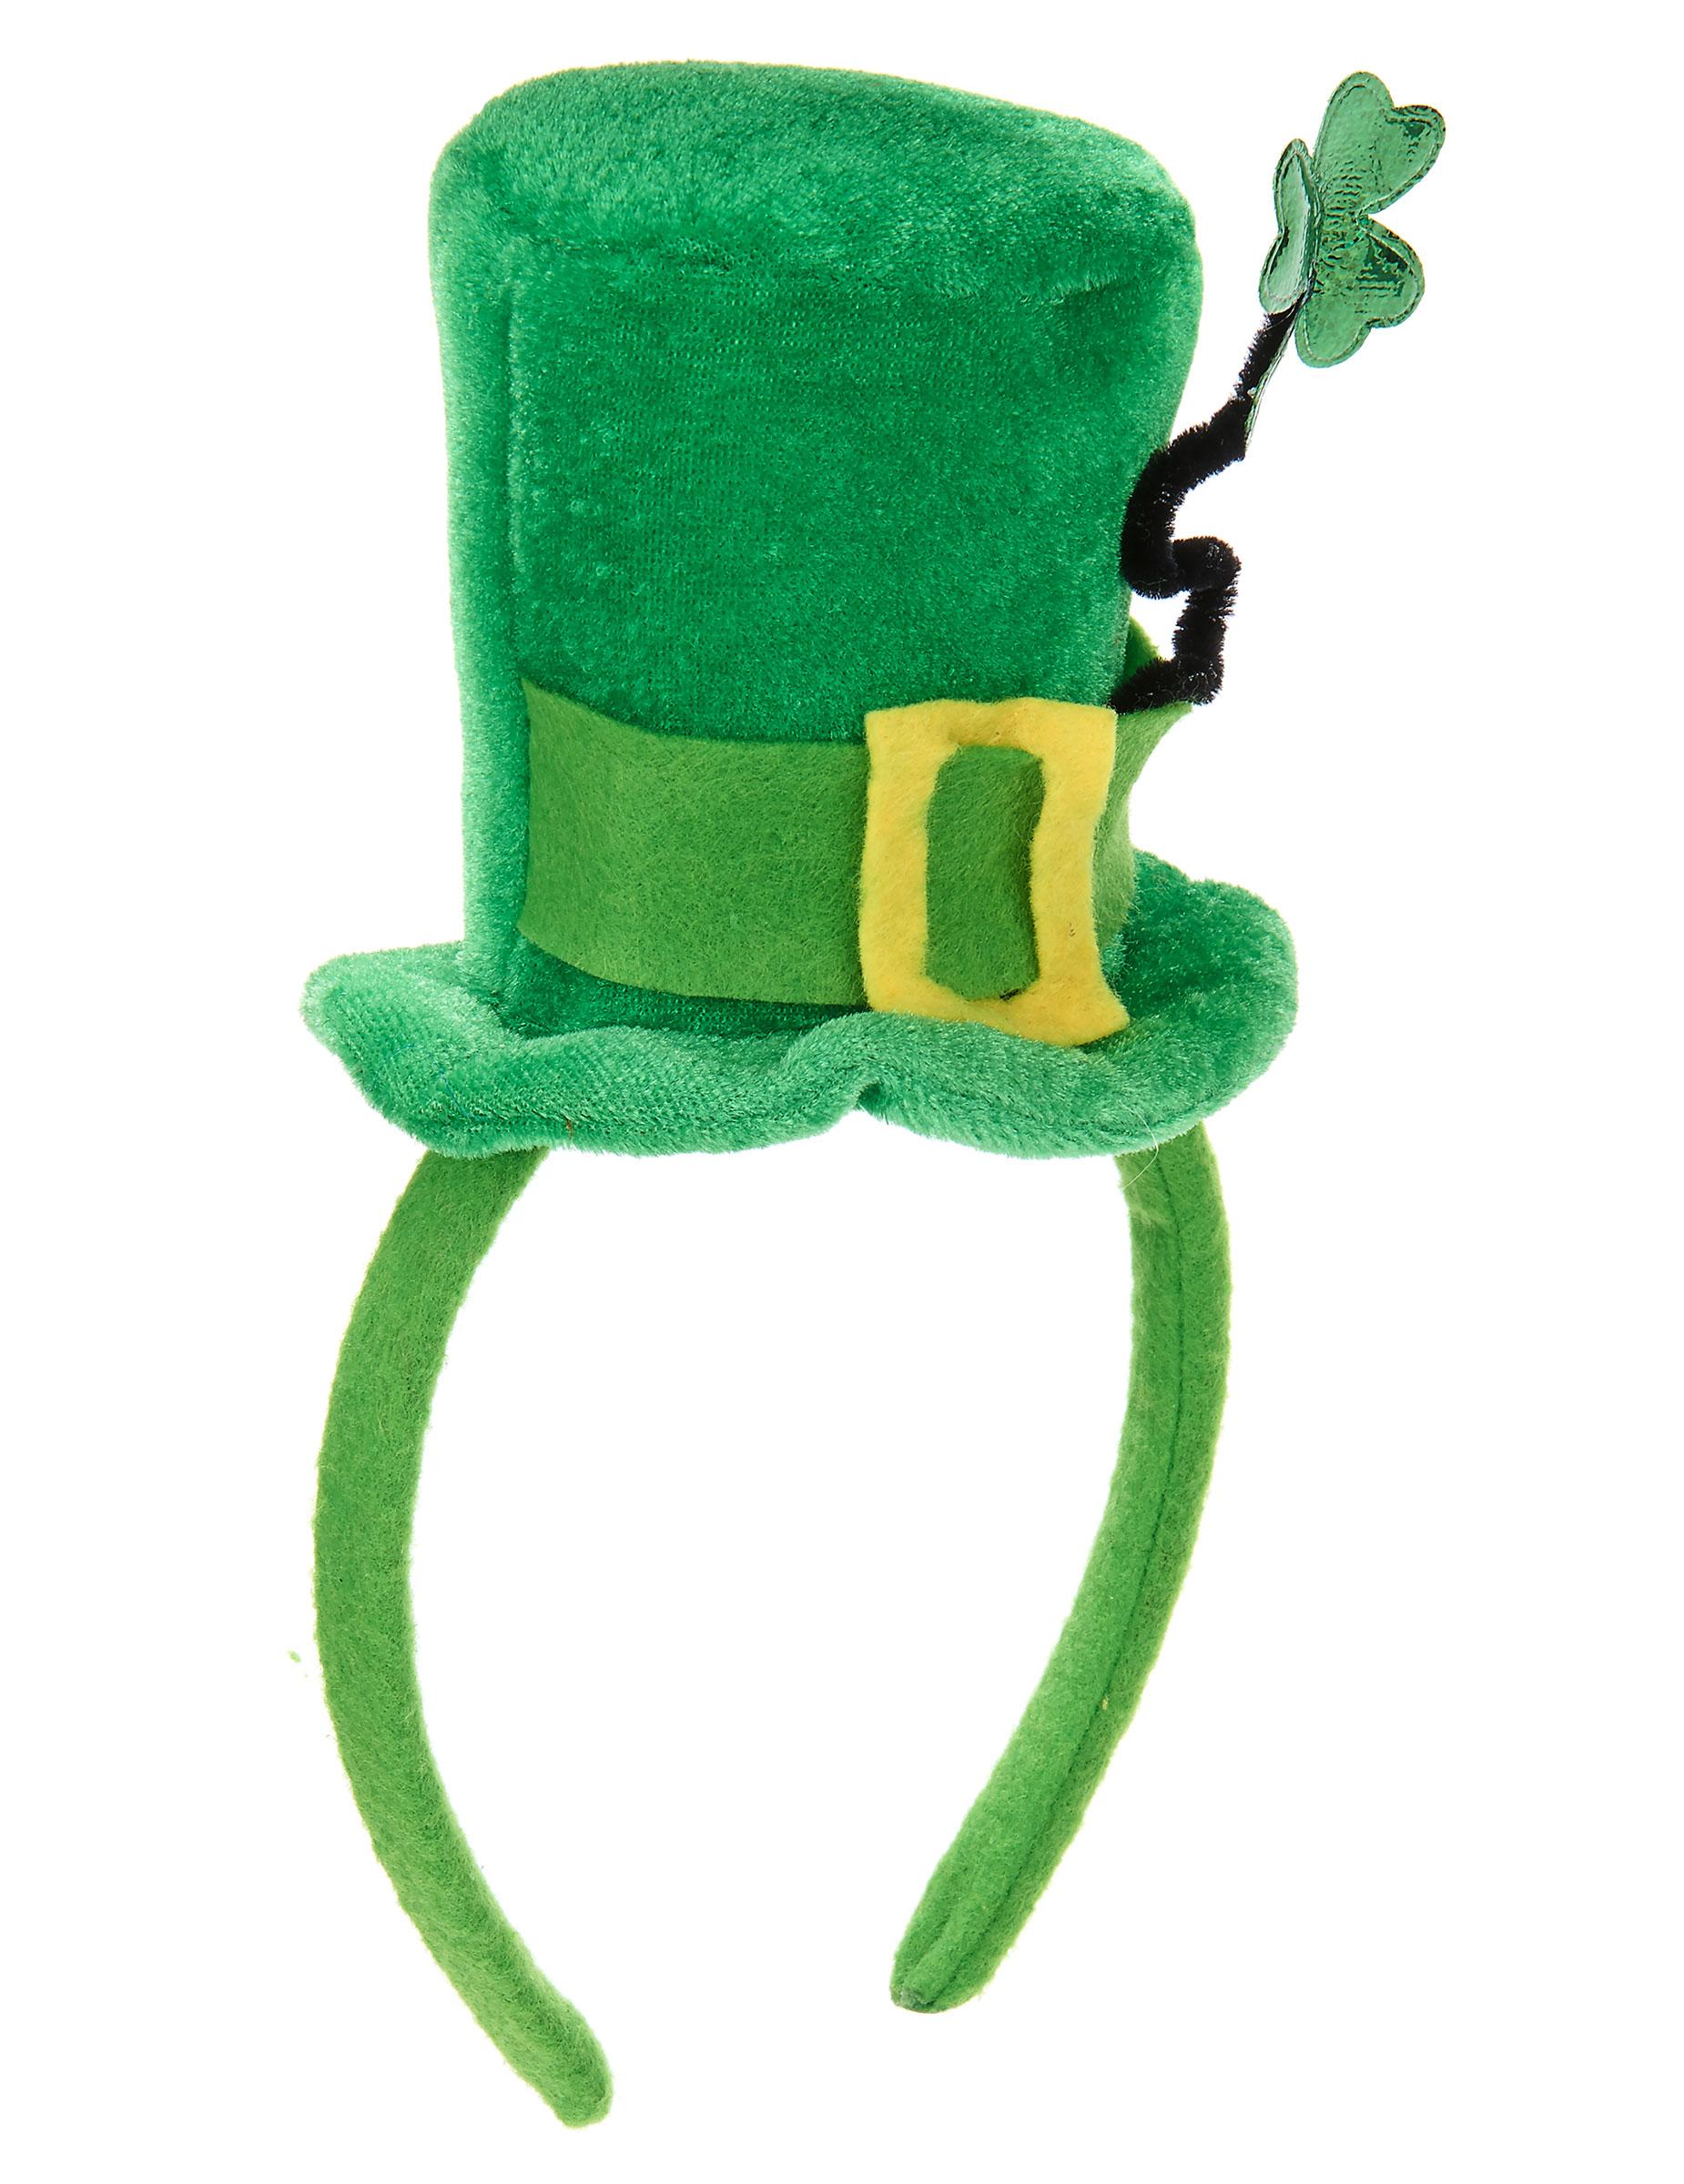 Mini-cappellini su cerchietto per serate in maschera su Vegaoo.it 14a9da30c2a5